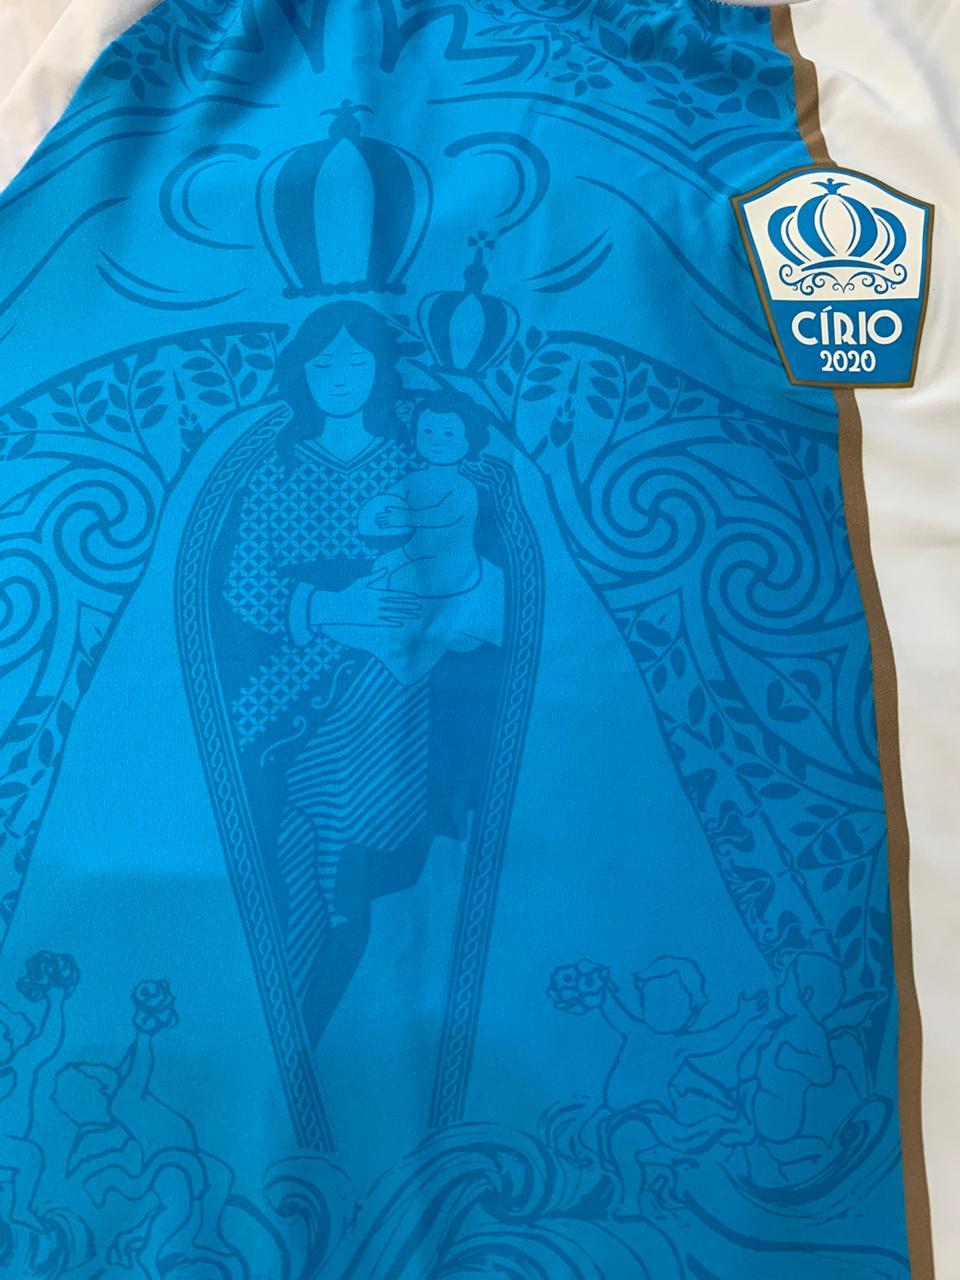 Camisa Círio de Nazaré 2020 do Paysandu